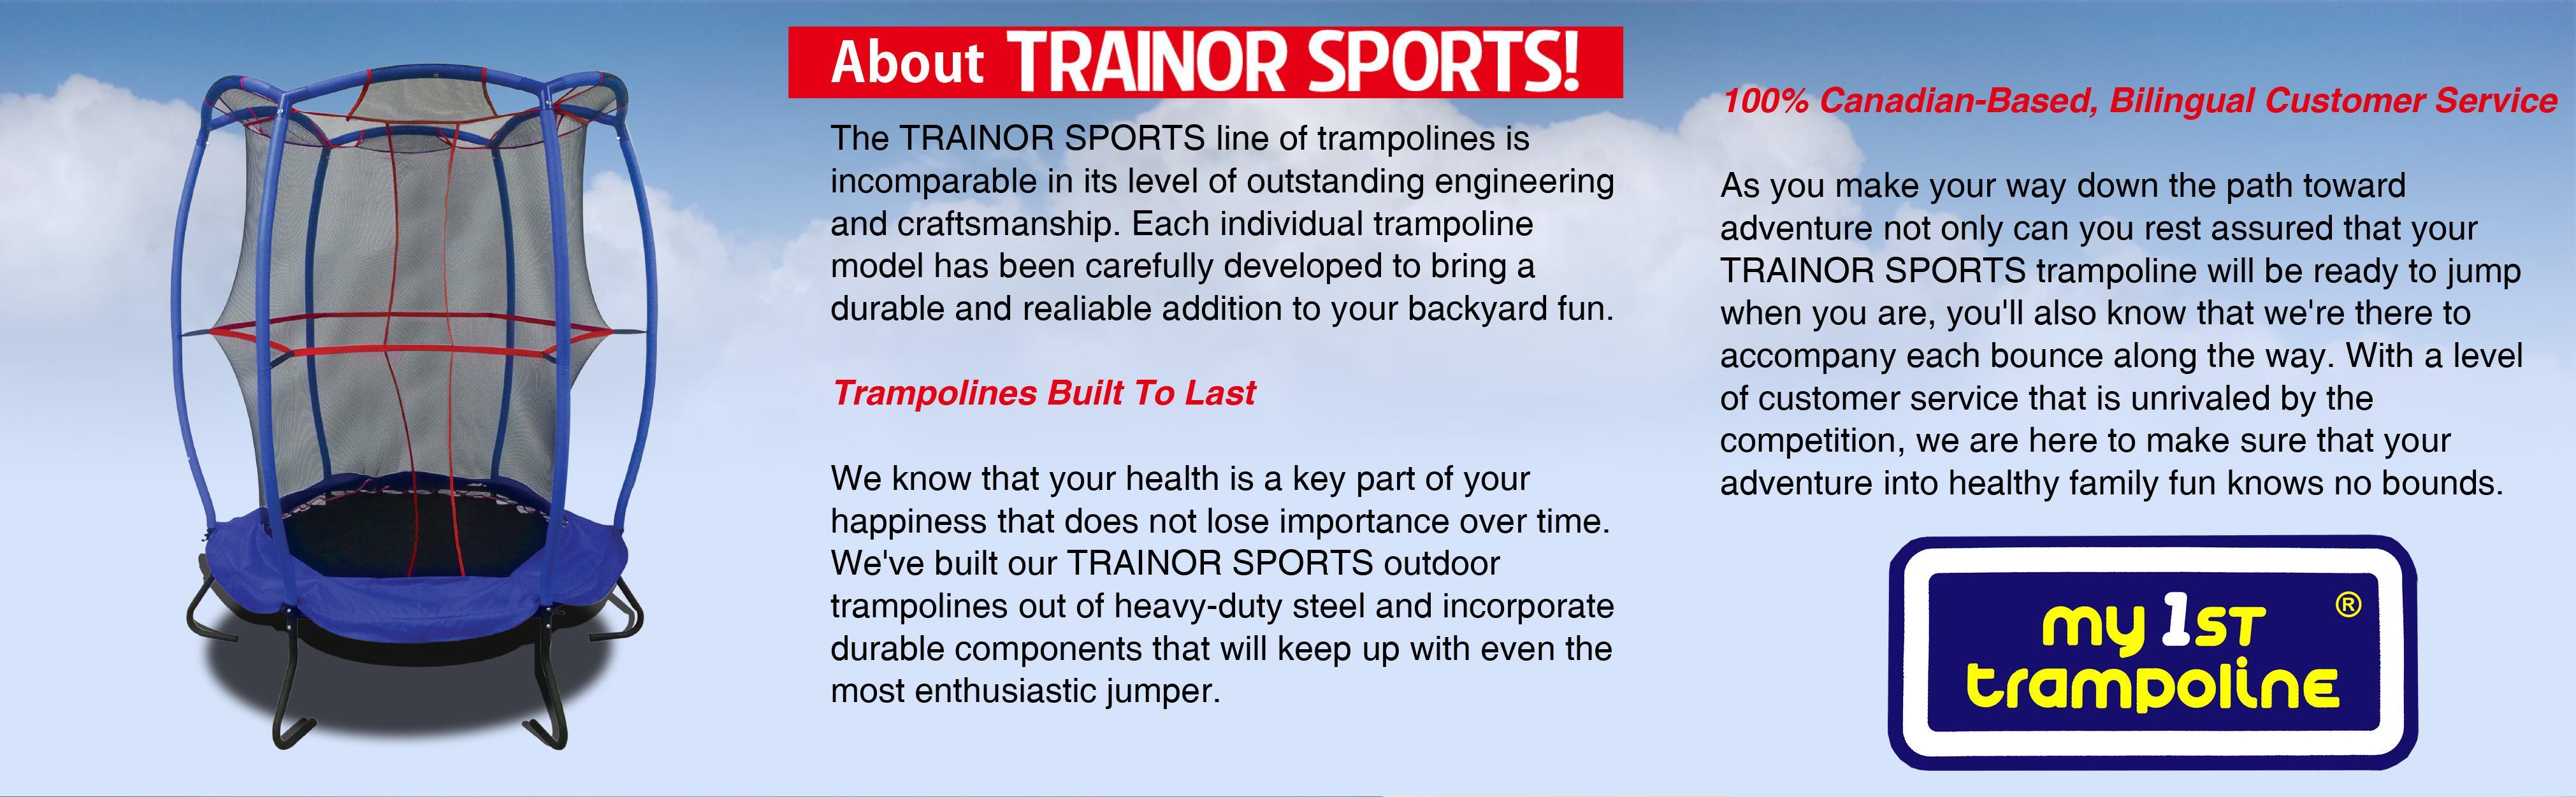 Trainor Sports 55